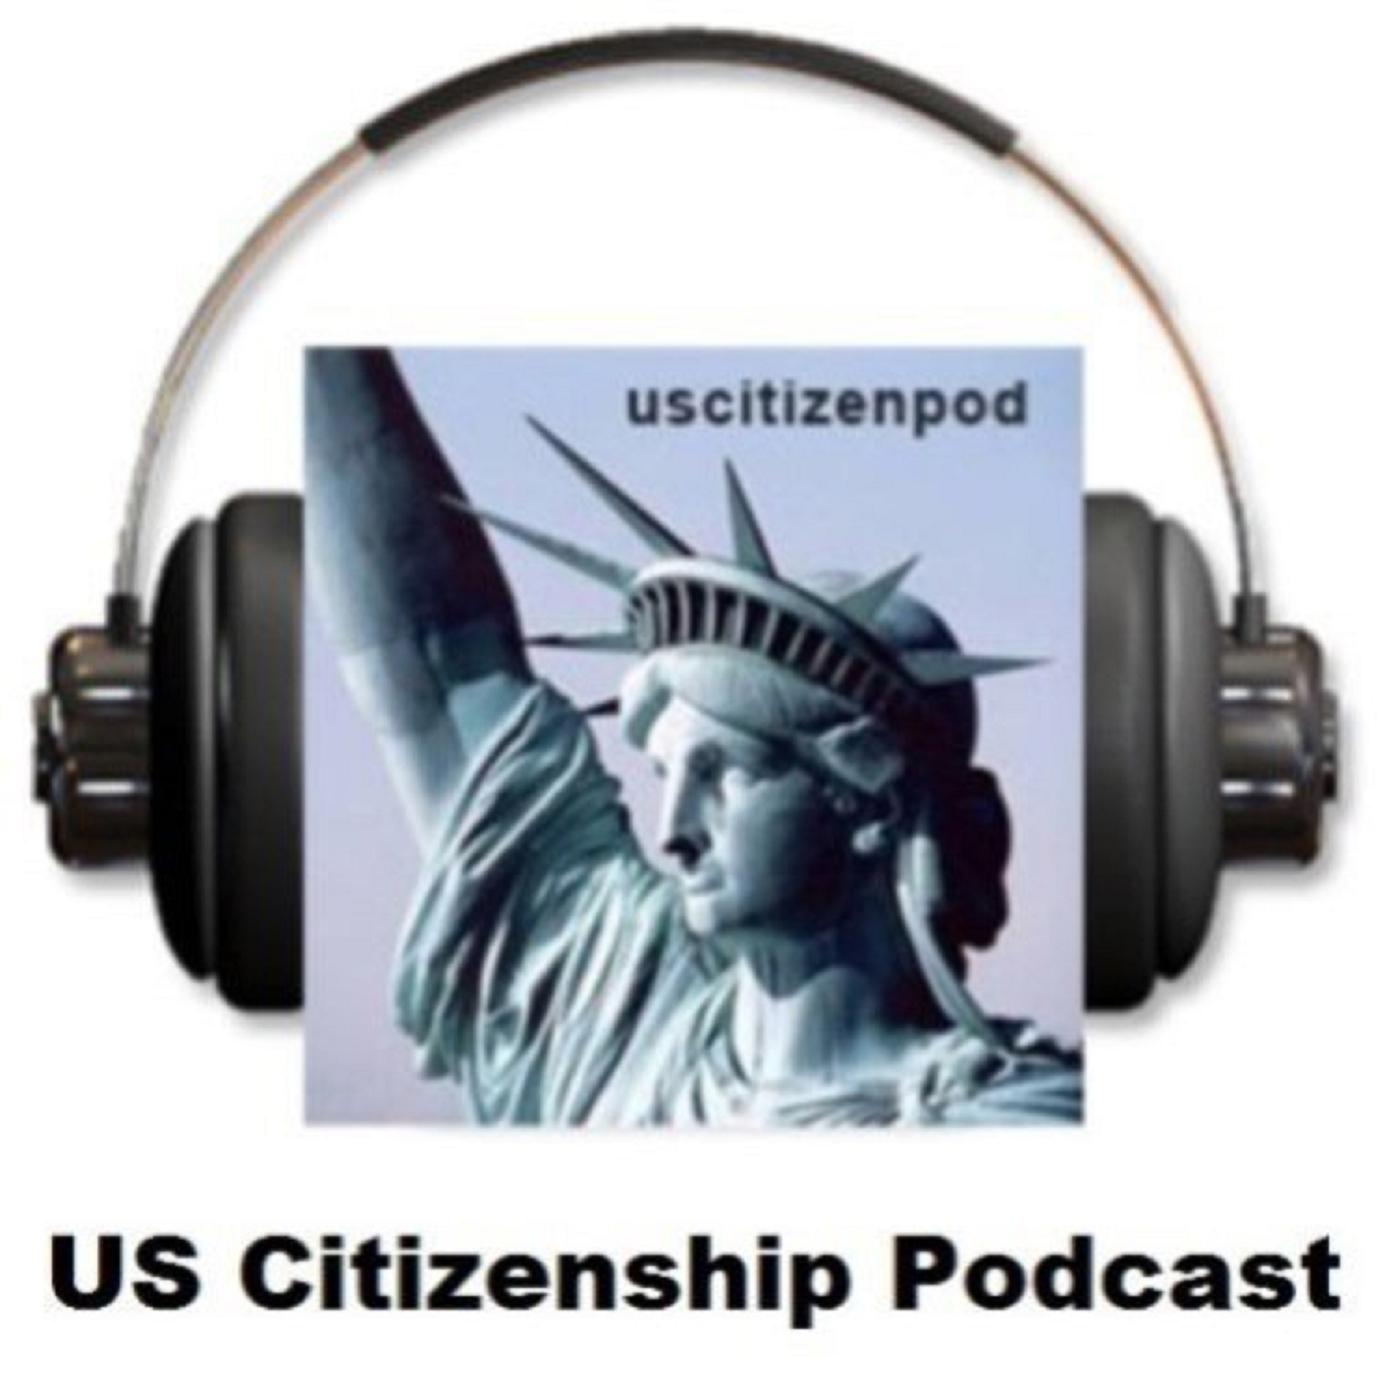 US Citizenship Podcast show art